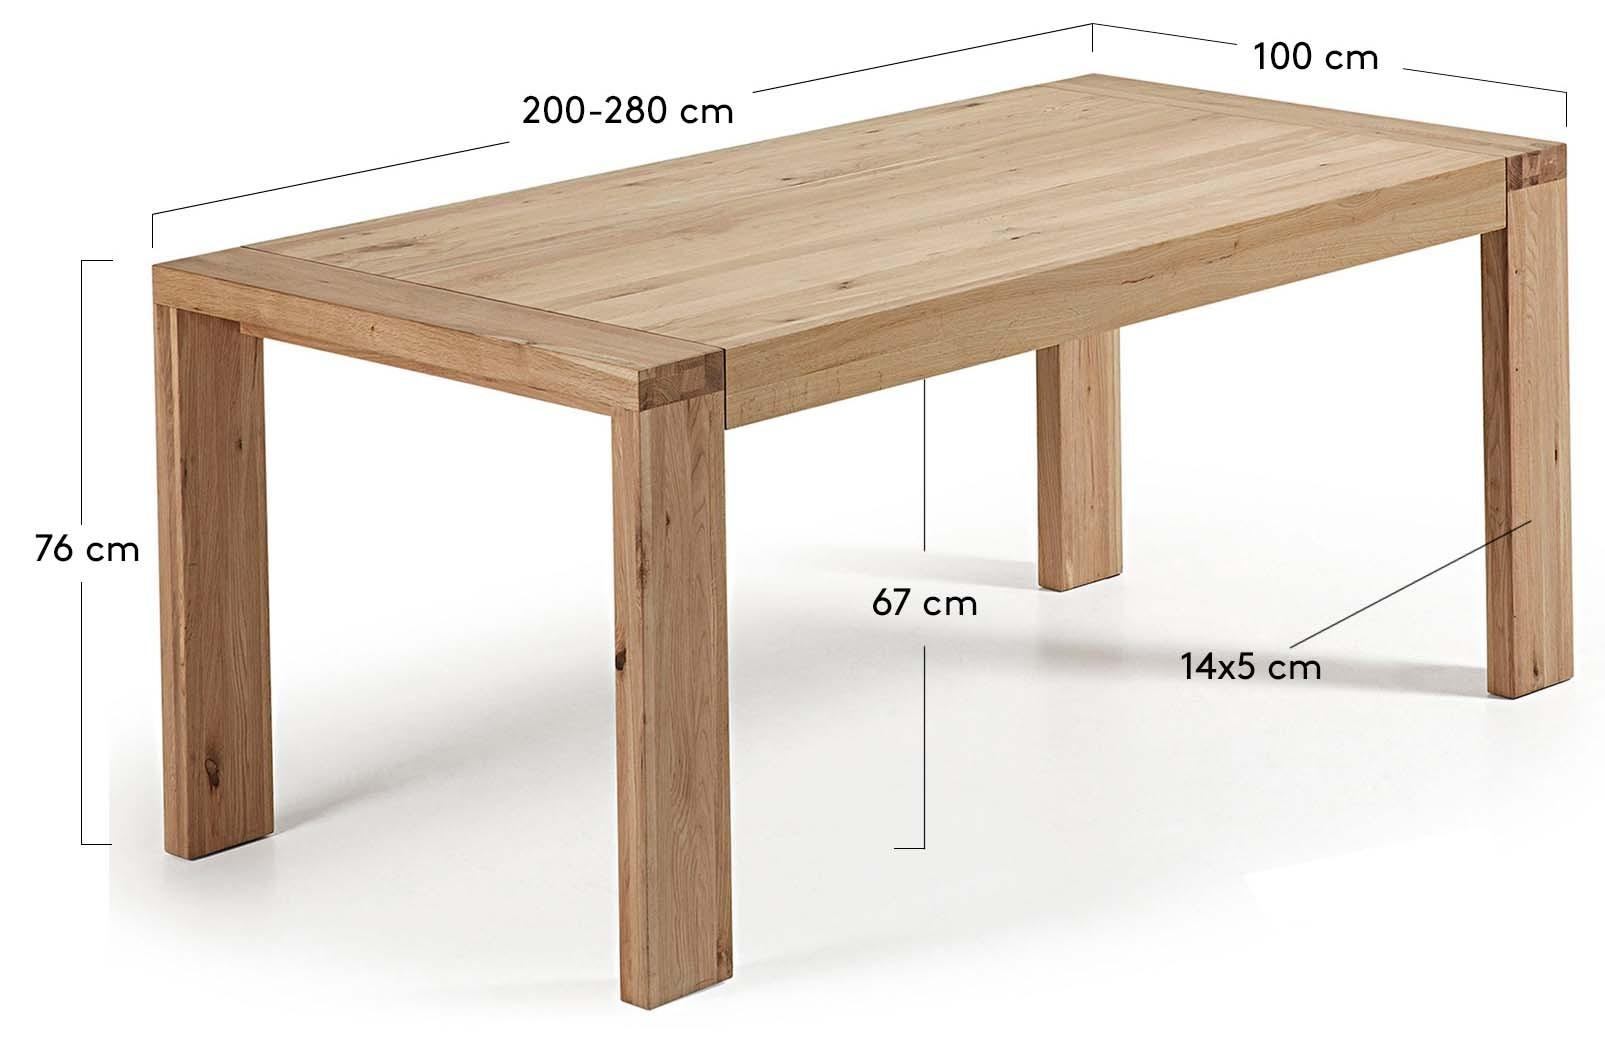 Natural 200-280x100 cm.